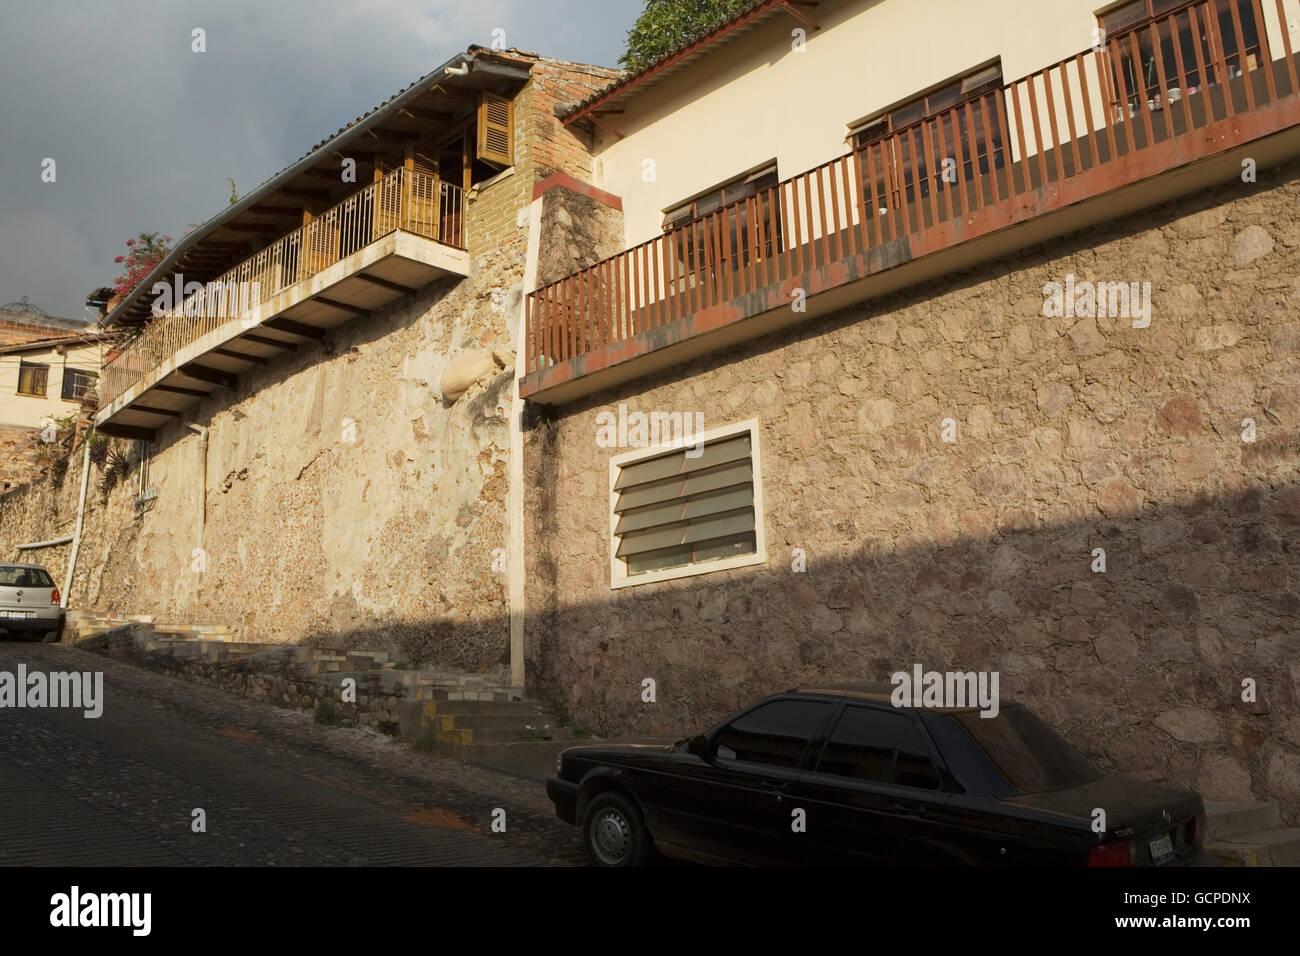 Mexico Puerto Vallarta; old-time architecture - Stock Image